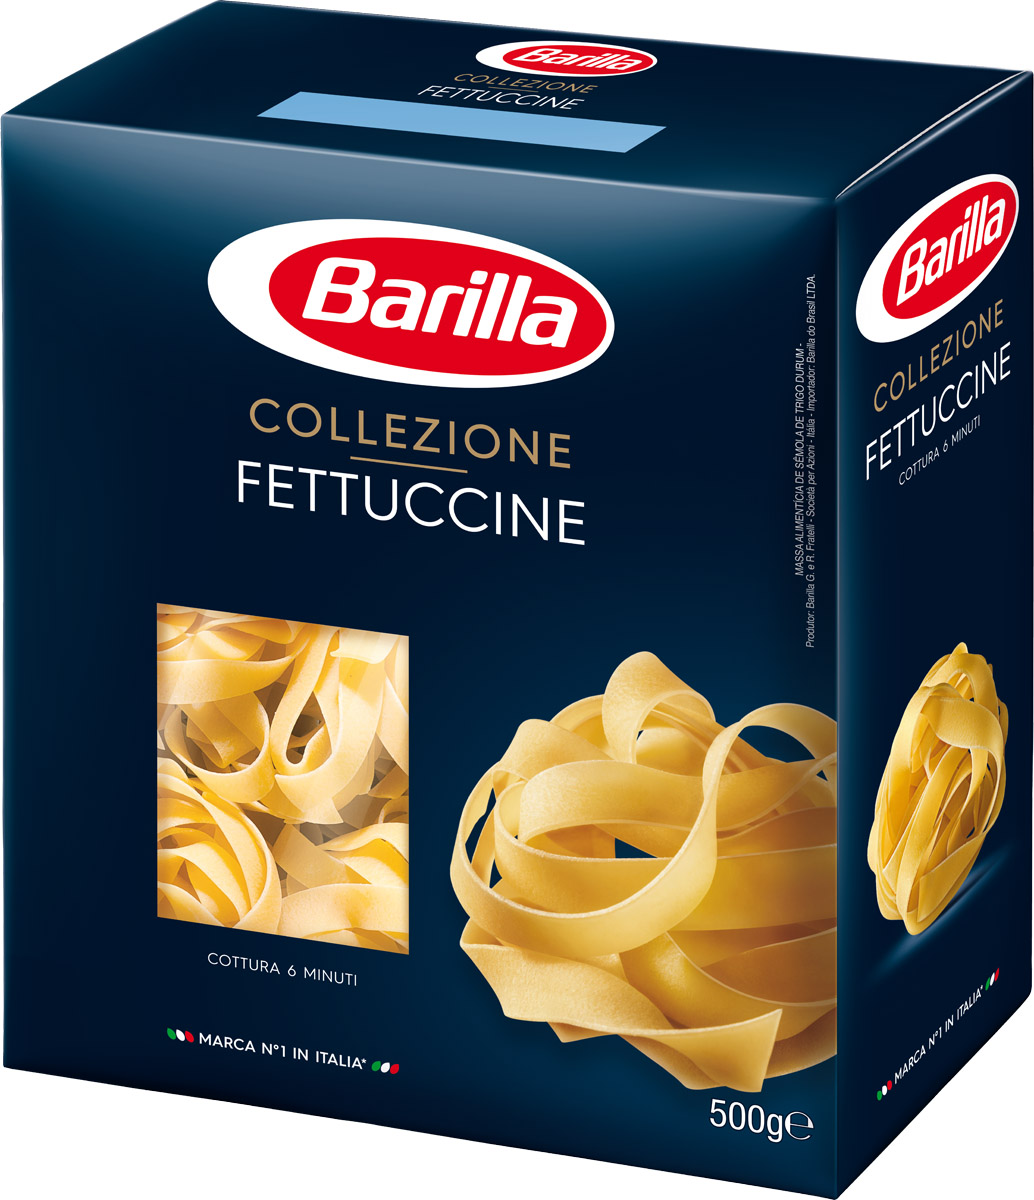 Barilla Fettuccine паста феттучине, 500 г romeo rossi паста яичная 4 яйца ригатони трехцветная 500 г